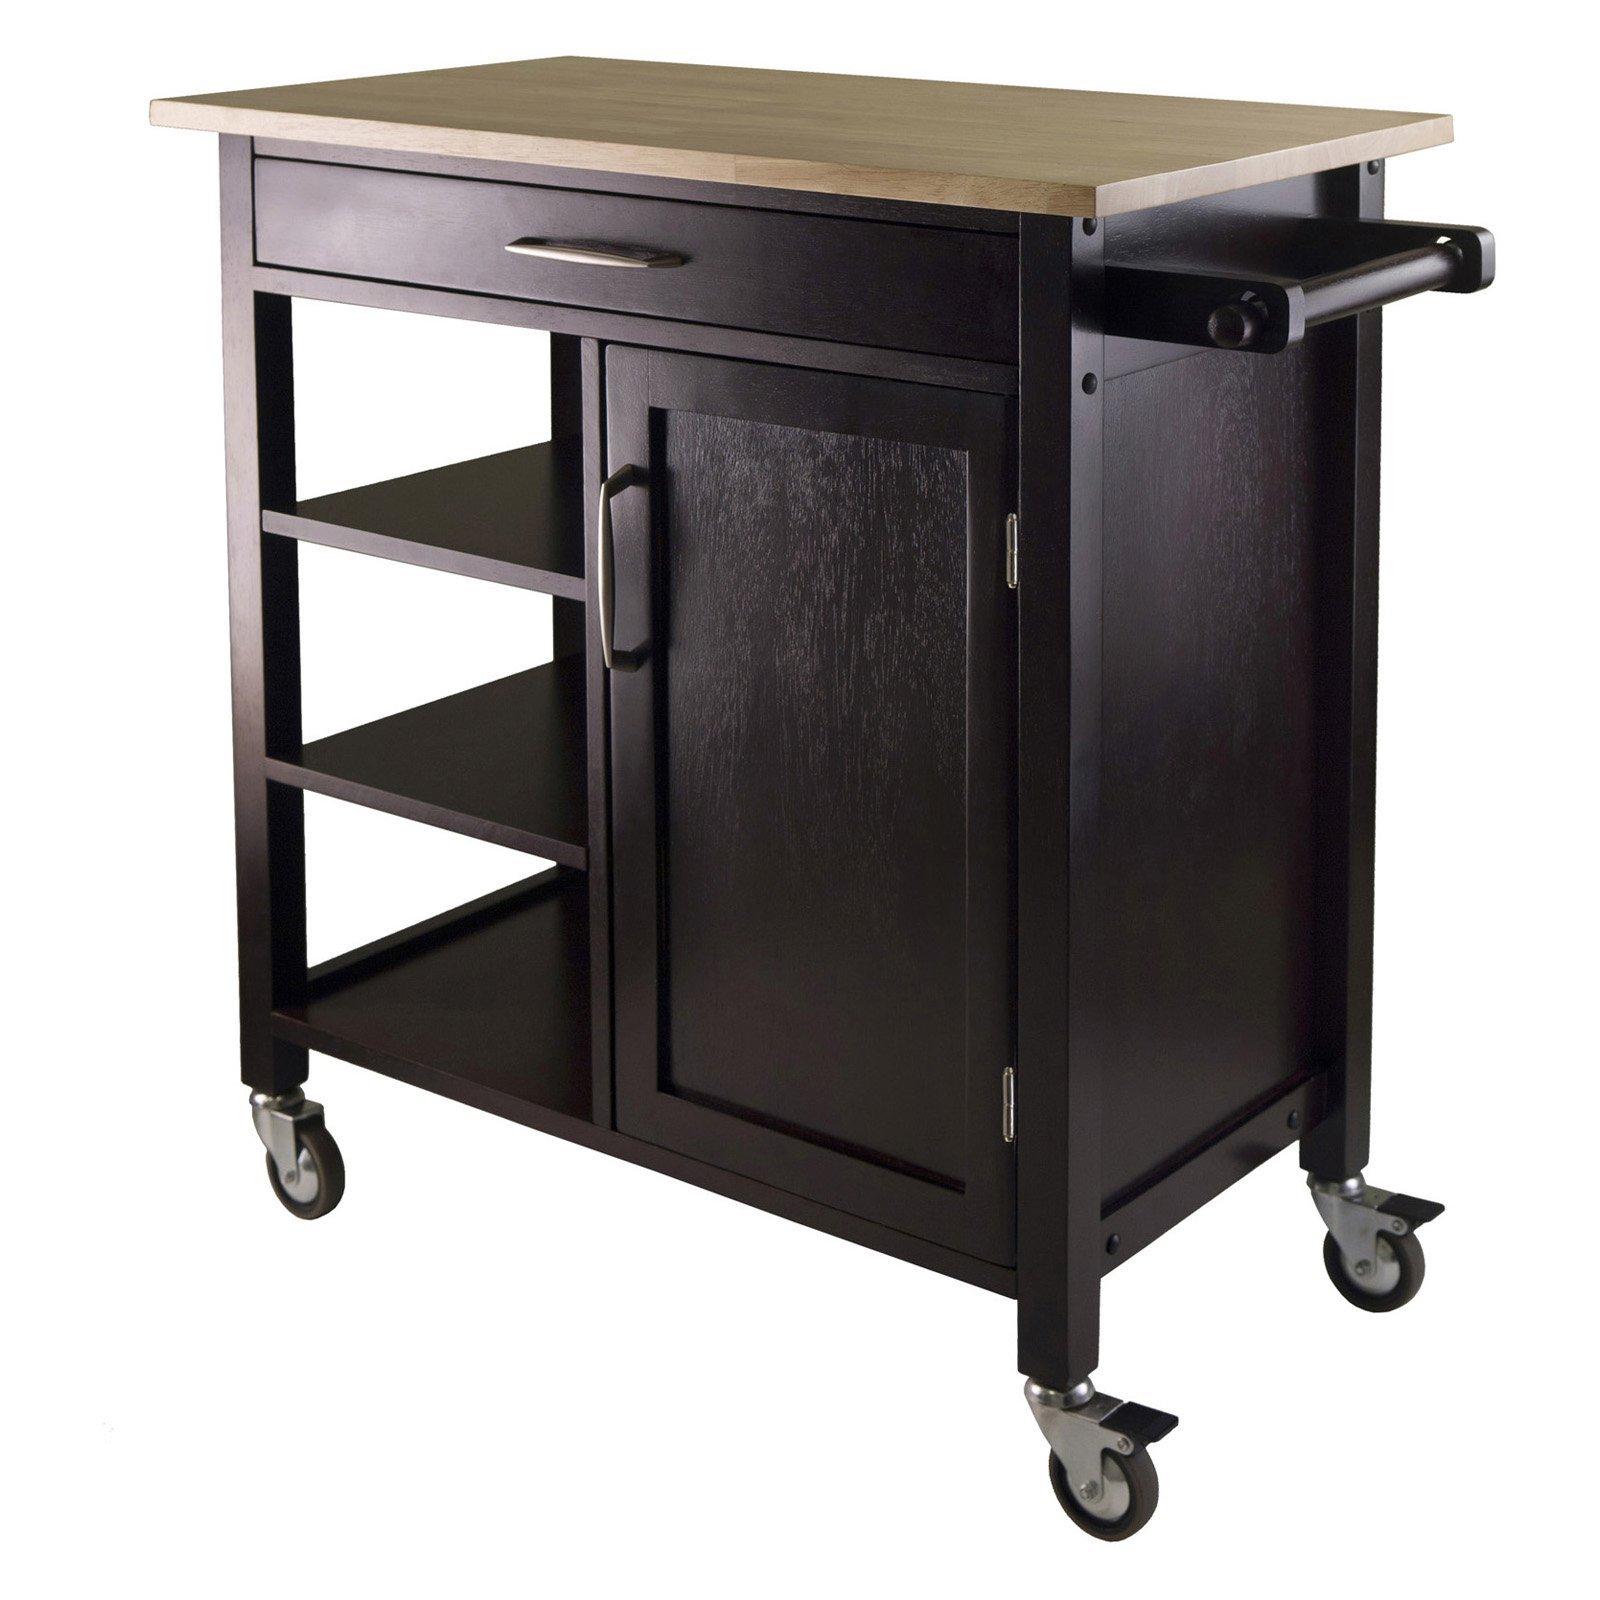 kitchen cart island utility food prep storage wooden furniture shelves